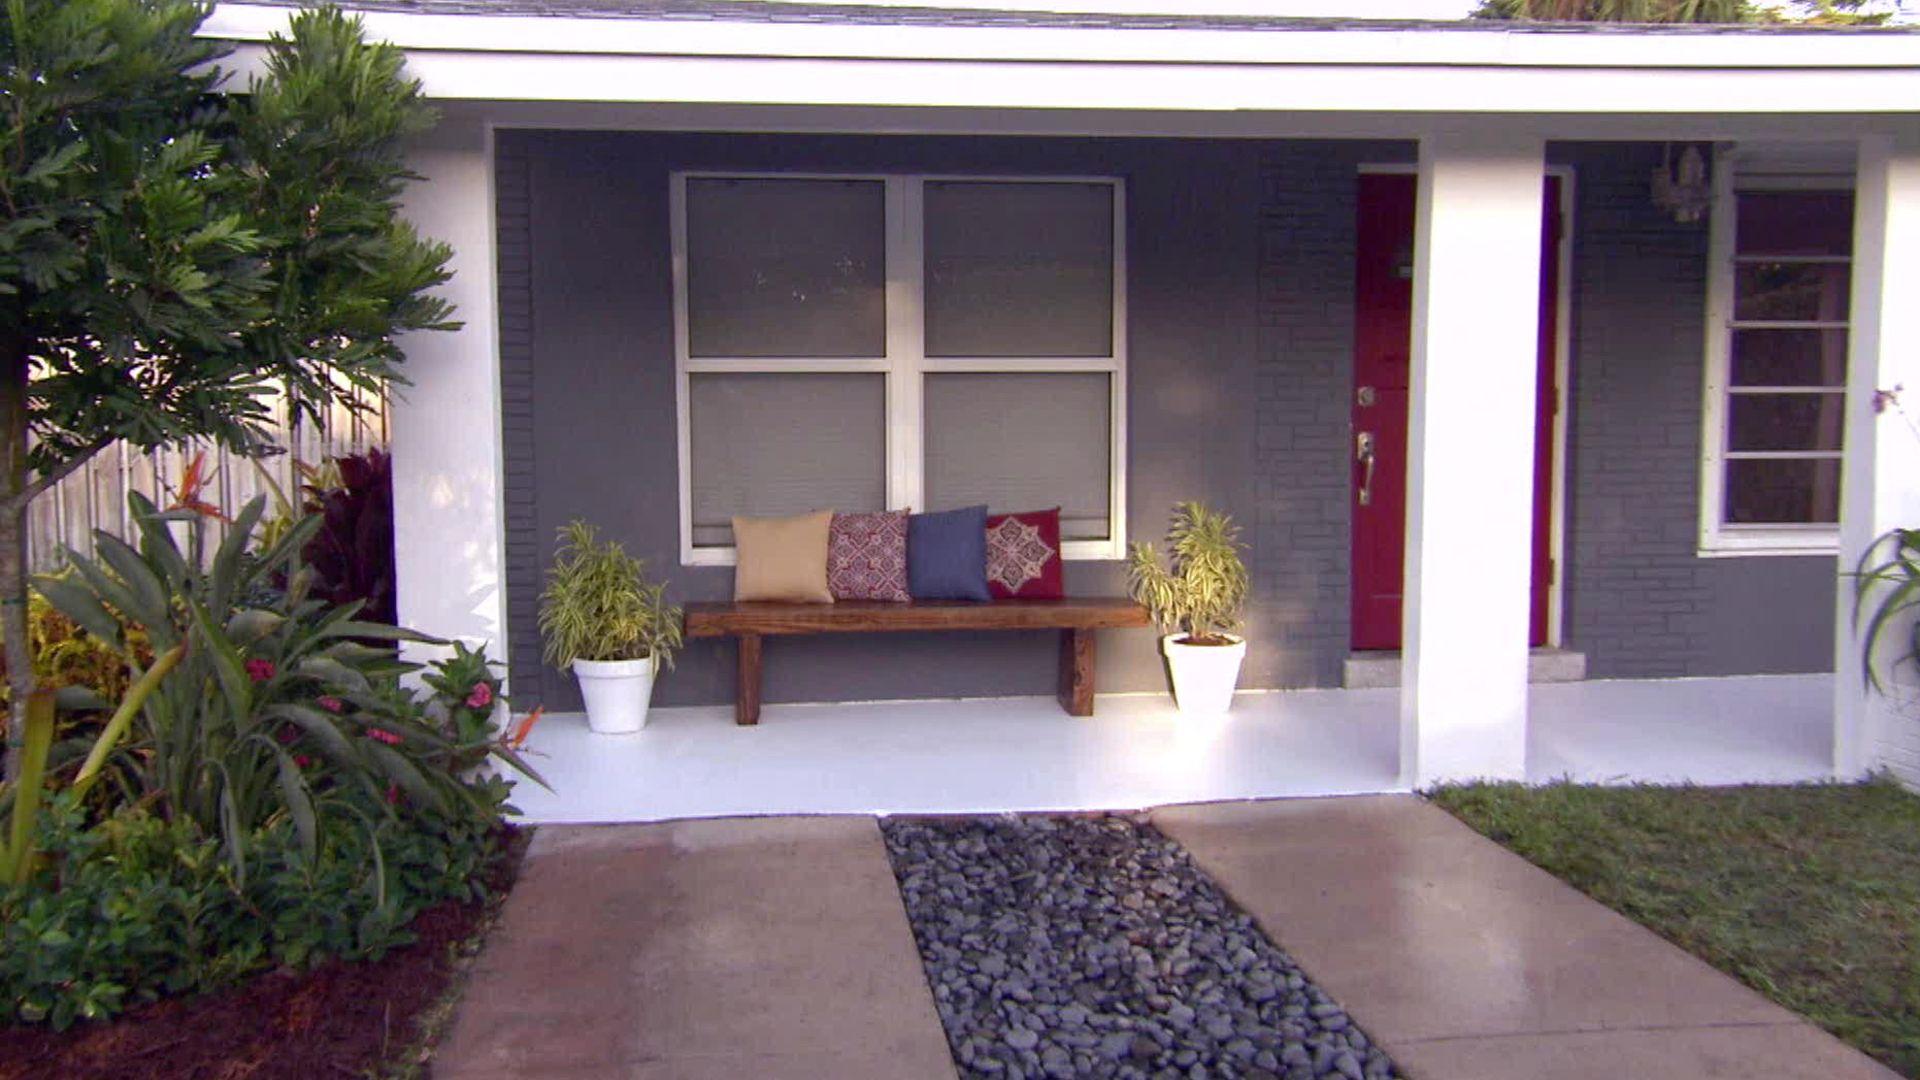 Carport an Extra Room Video HGTV Bungalow